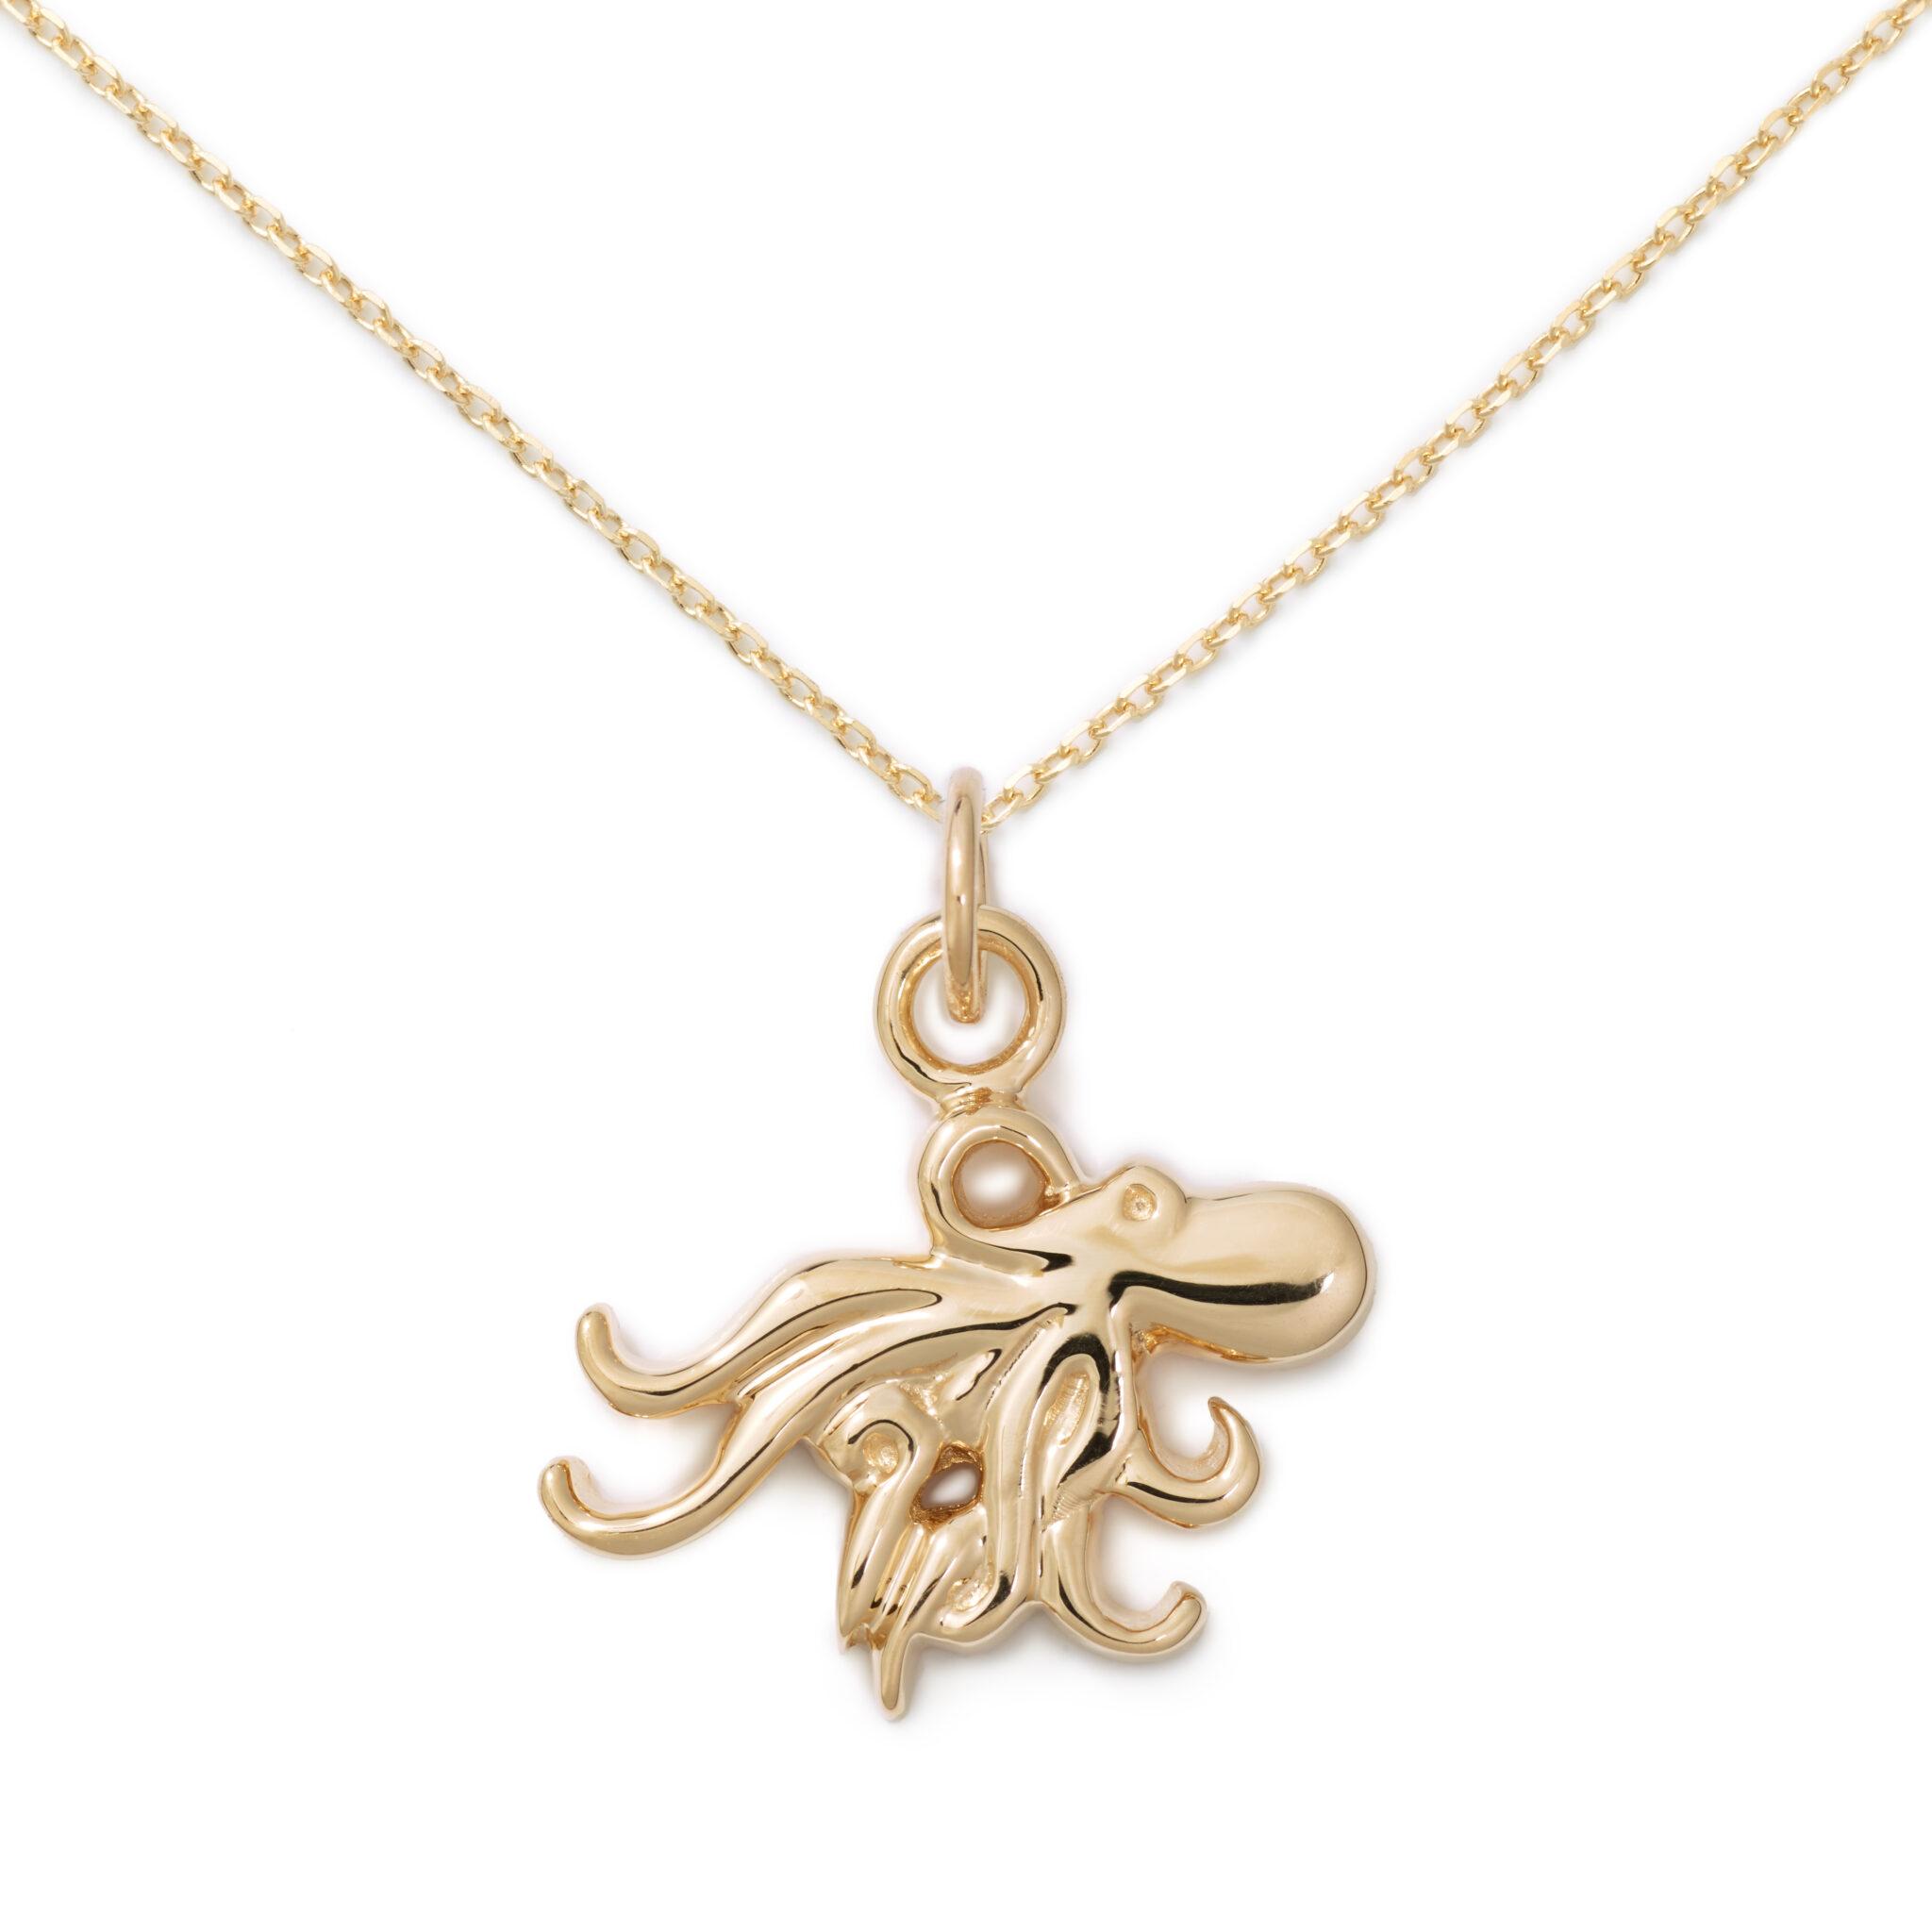 Octopus Pendant, 14K Yellow Gold